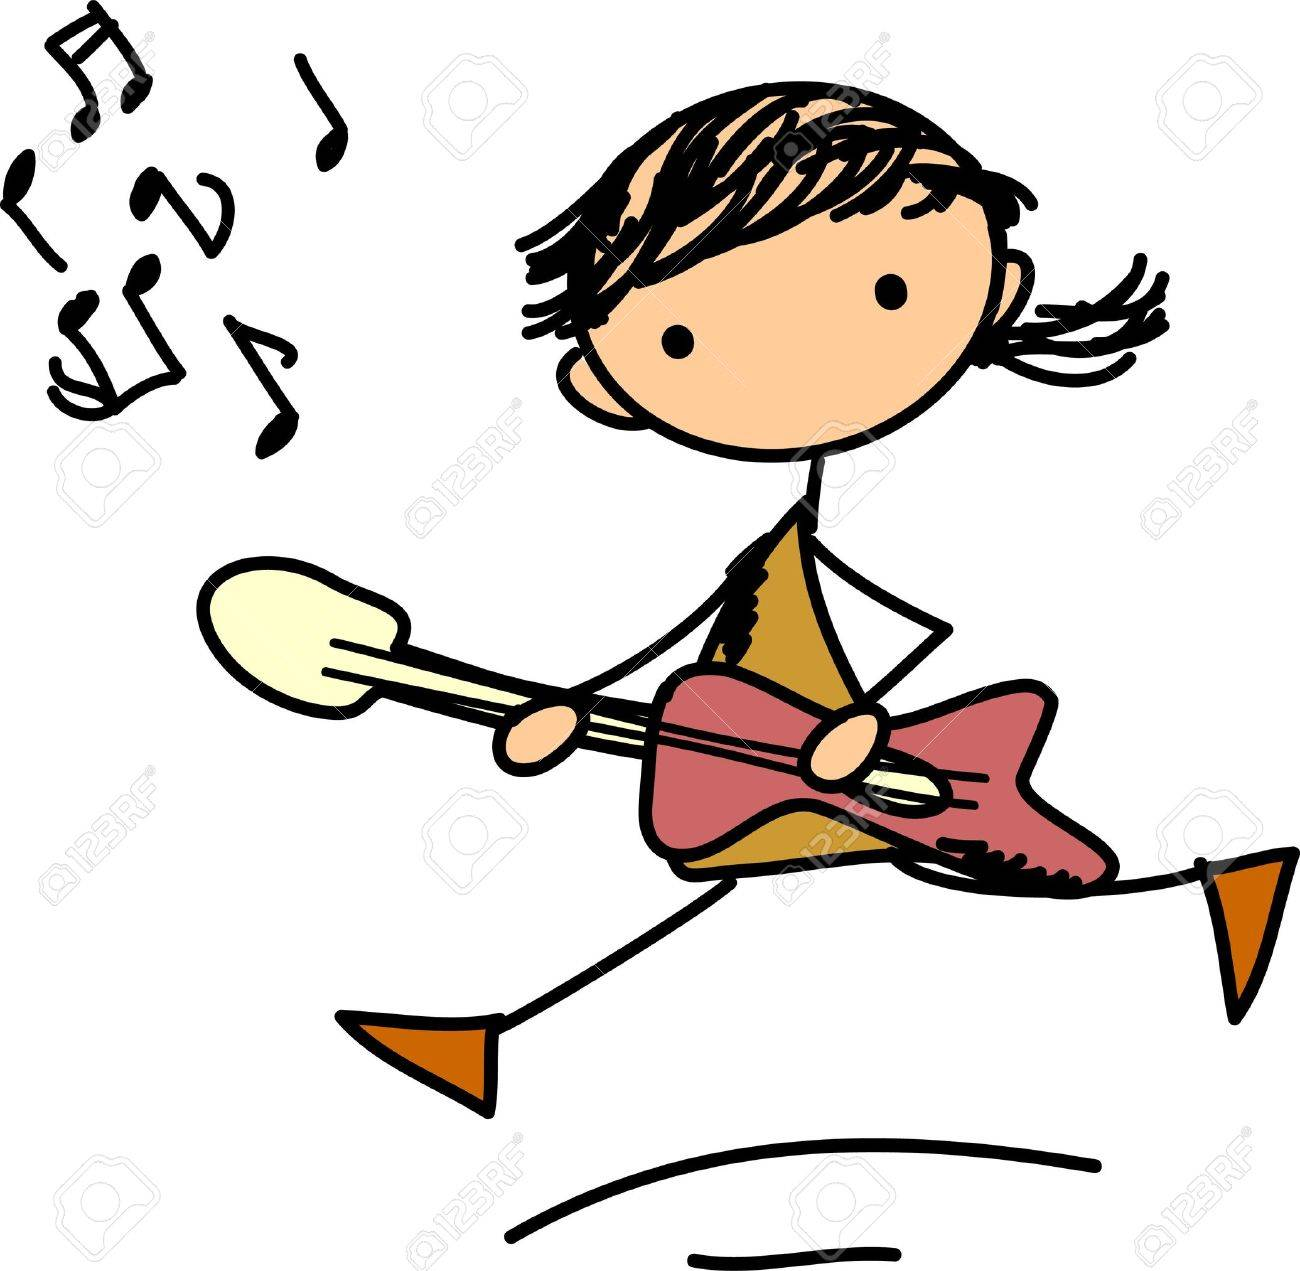 Music Doodles Stock Vector - 11213528